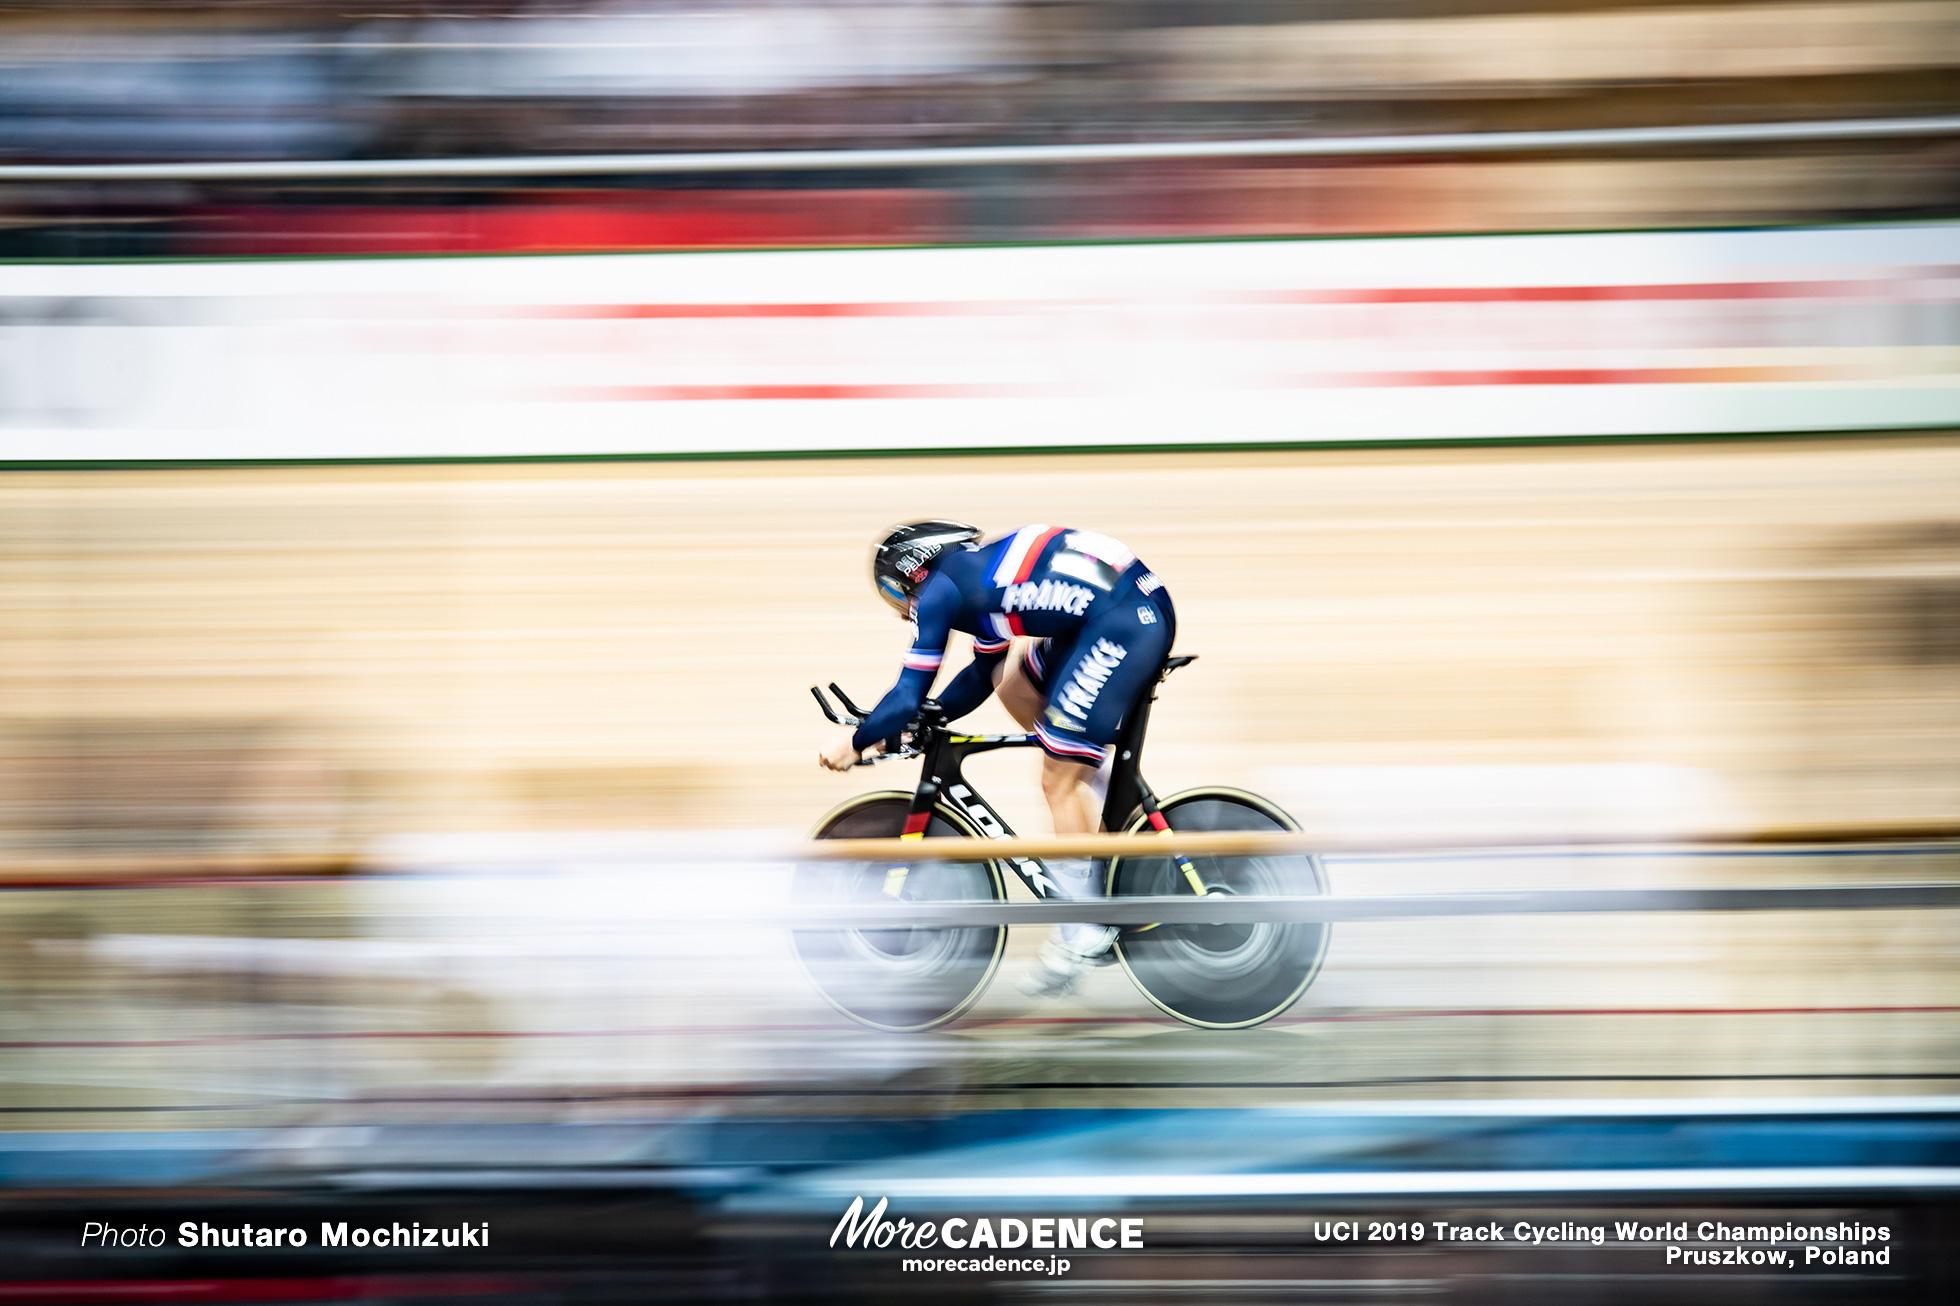 Men's 1km TT Qualifying / 2019 Track Cycling World Championships Pruszków, Poland